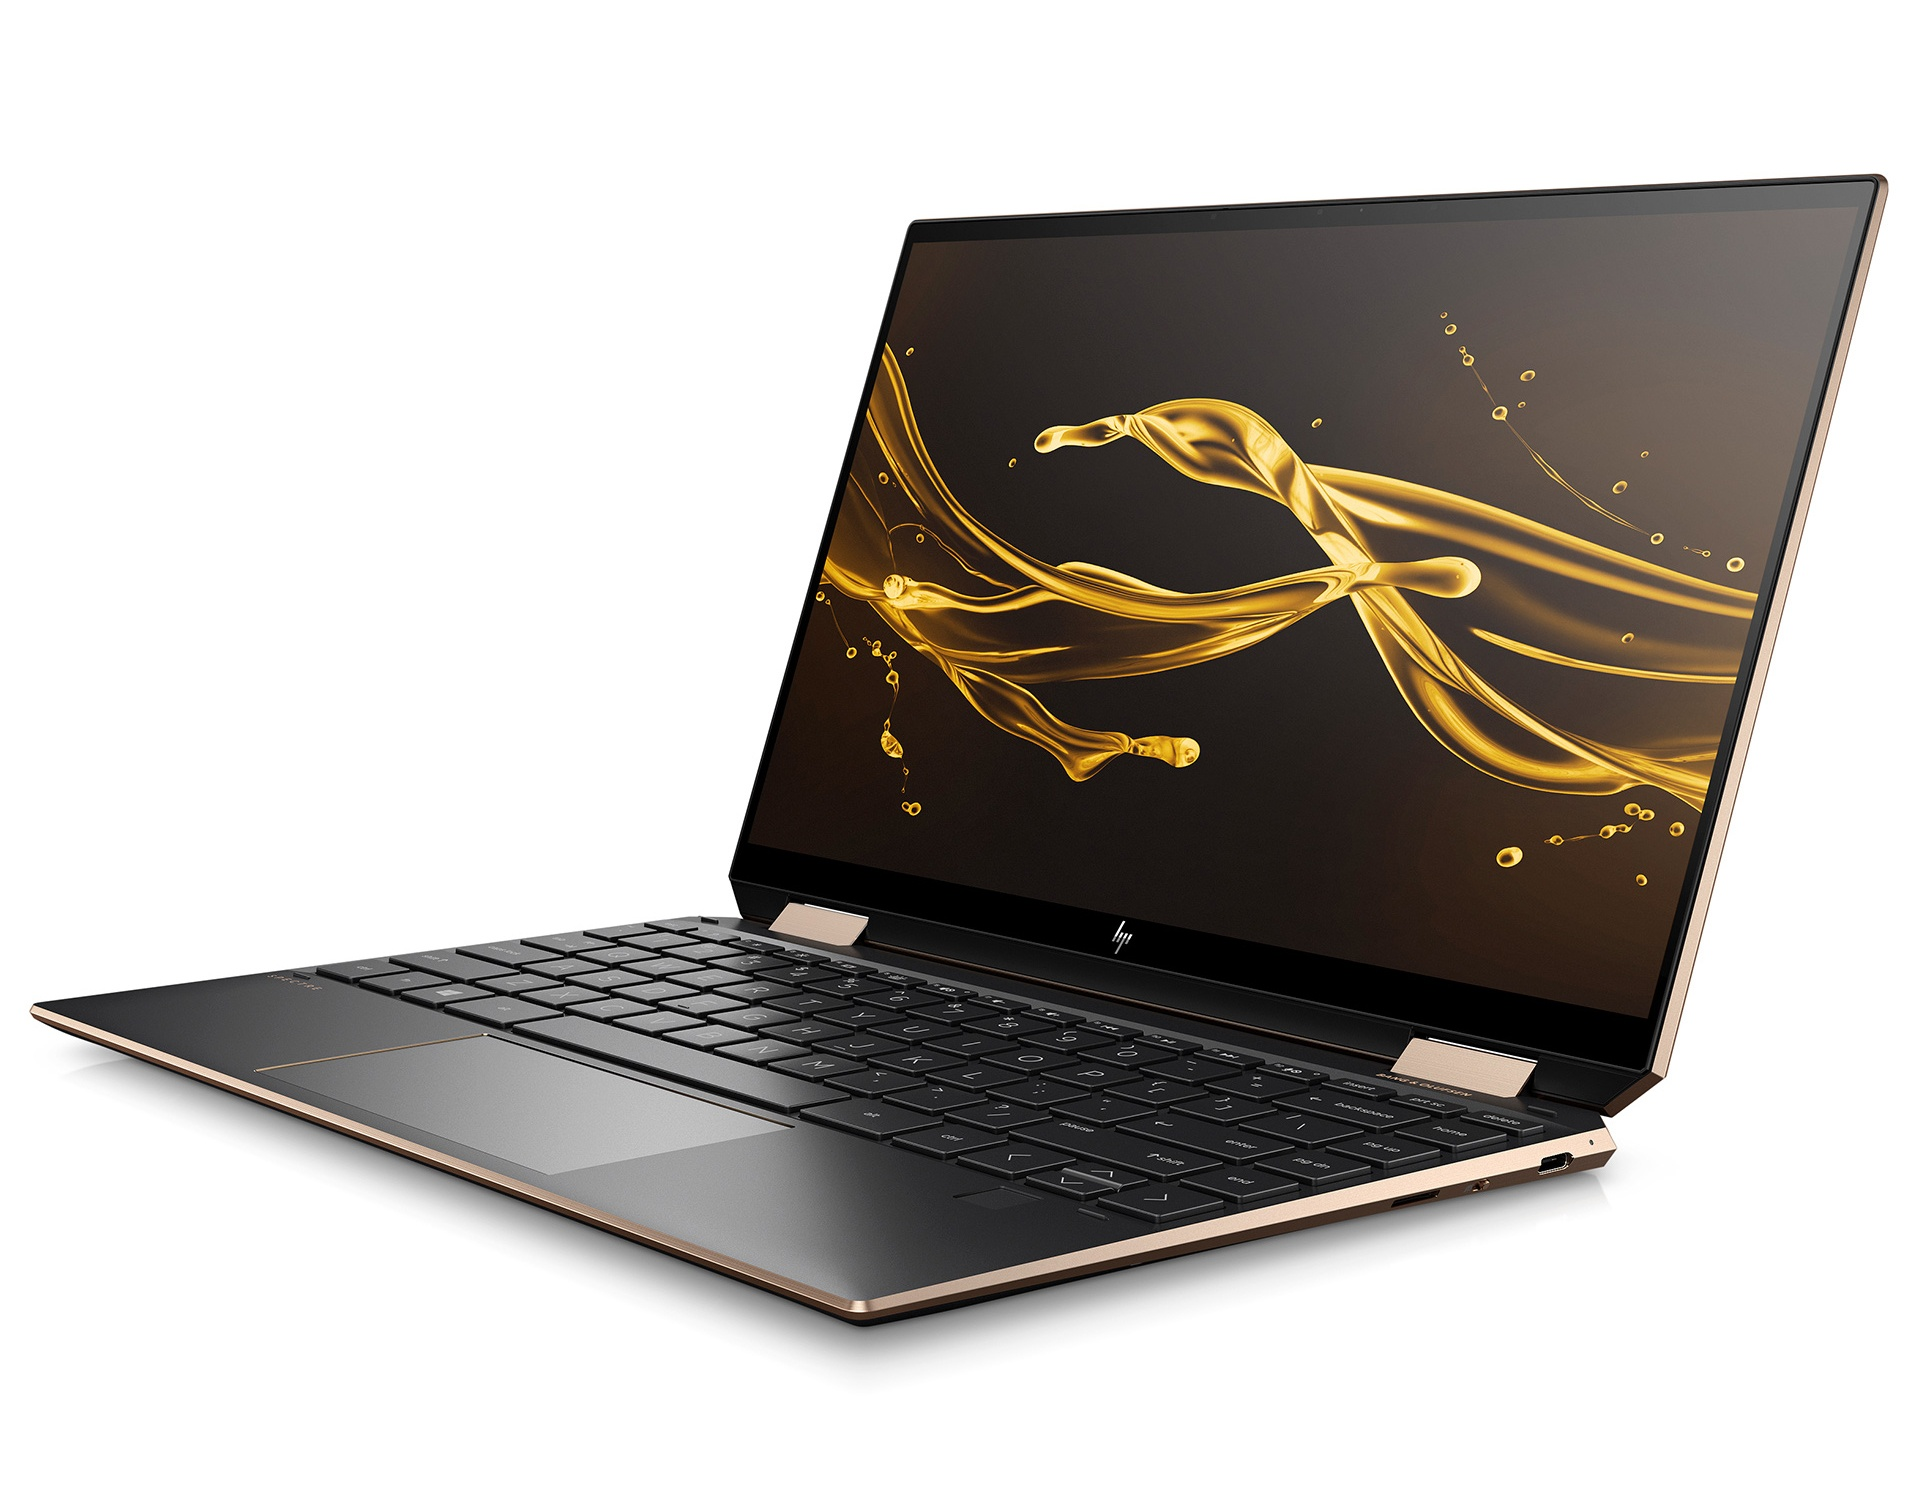 HP Spectre X360 13-aw0000の画像